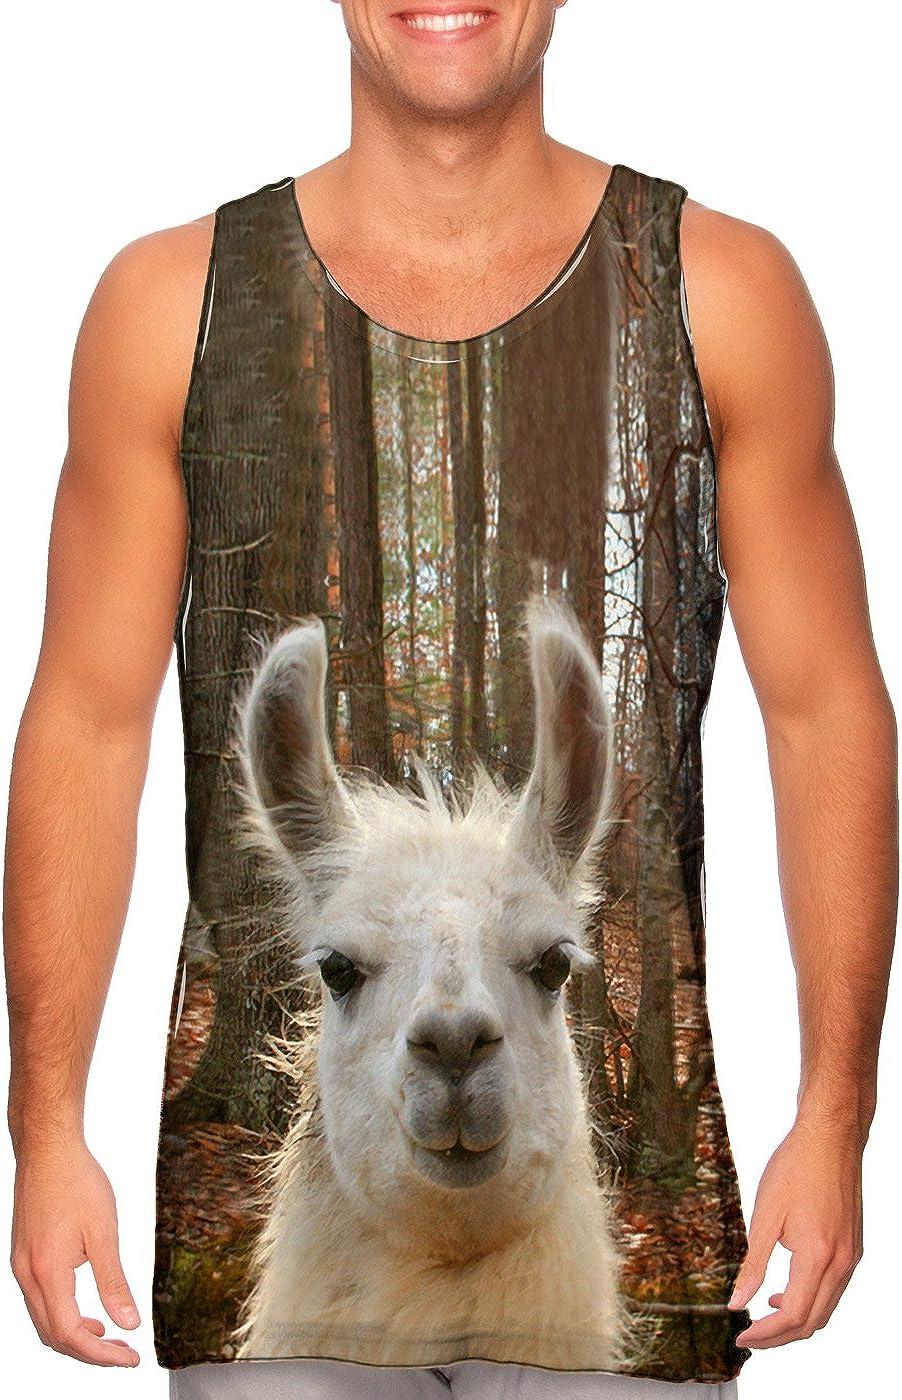 Yizzam AnimalShirtsUSA- You Don't Know -Tshirt- Mens Max 59% OFF Tank Max 57% OFF Llama